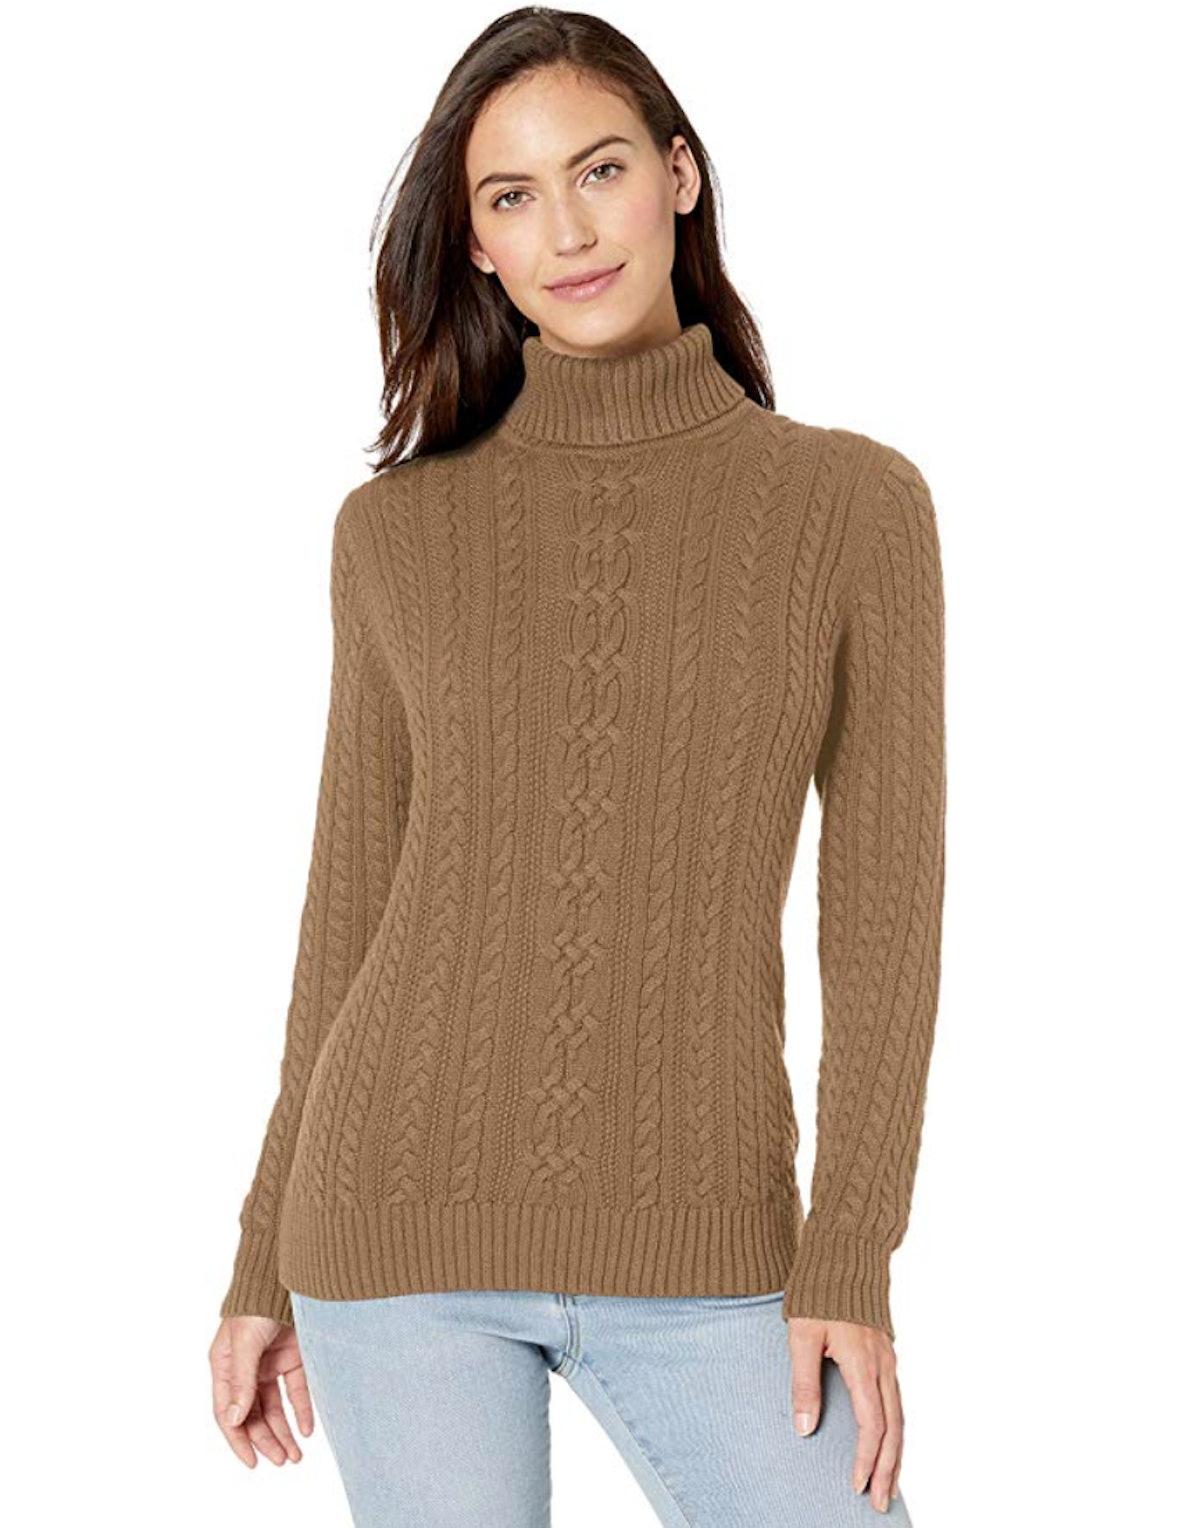 Amazon Essentials Fisherman Sweater